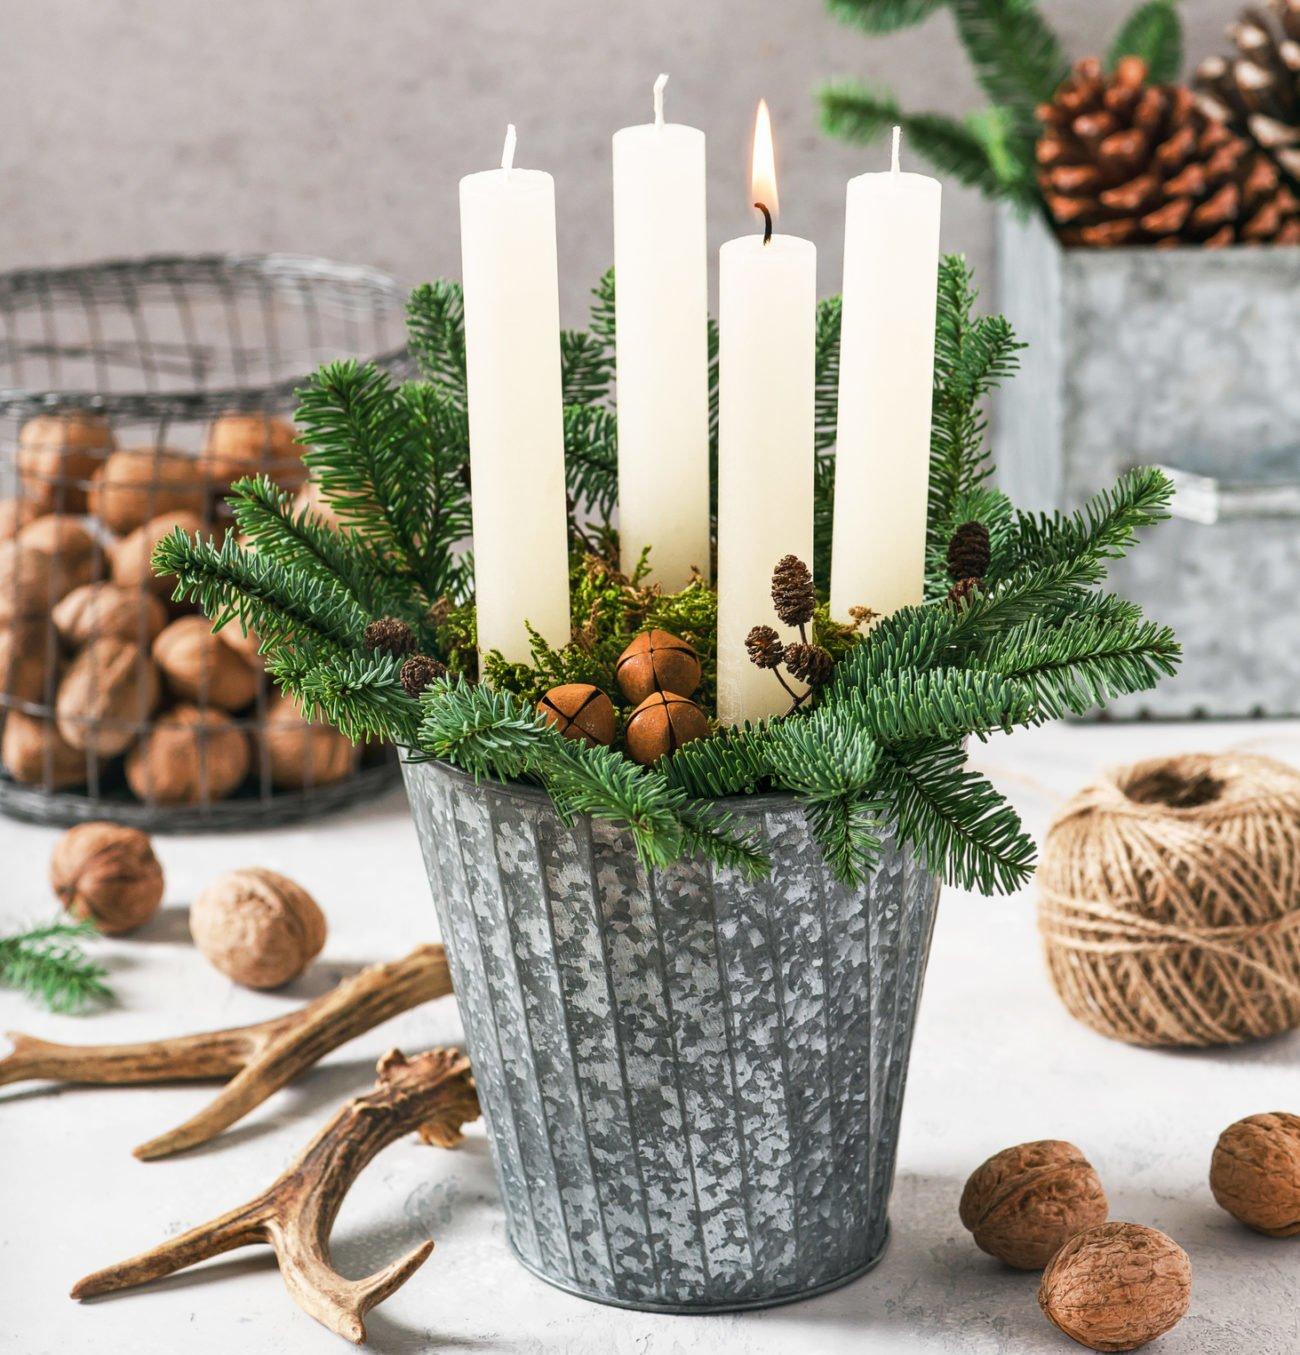 Adventsgesteck selber machen Blumentopf